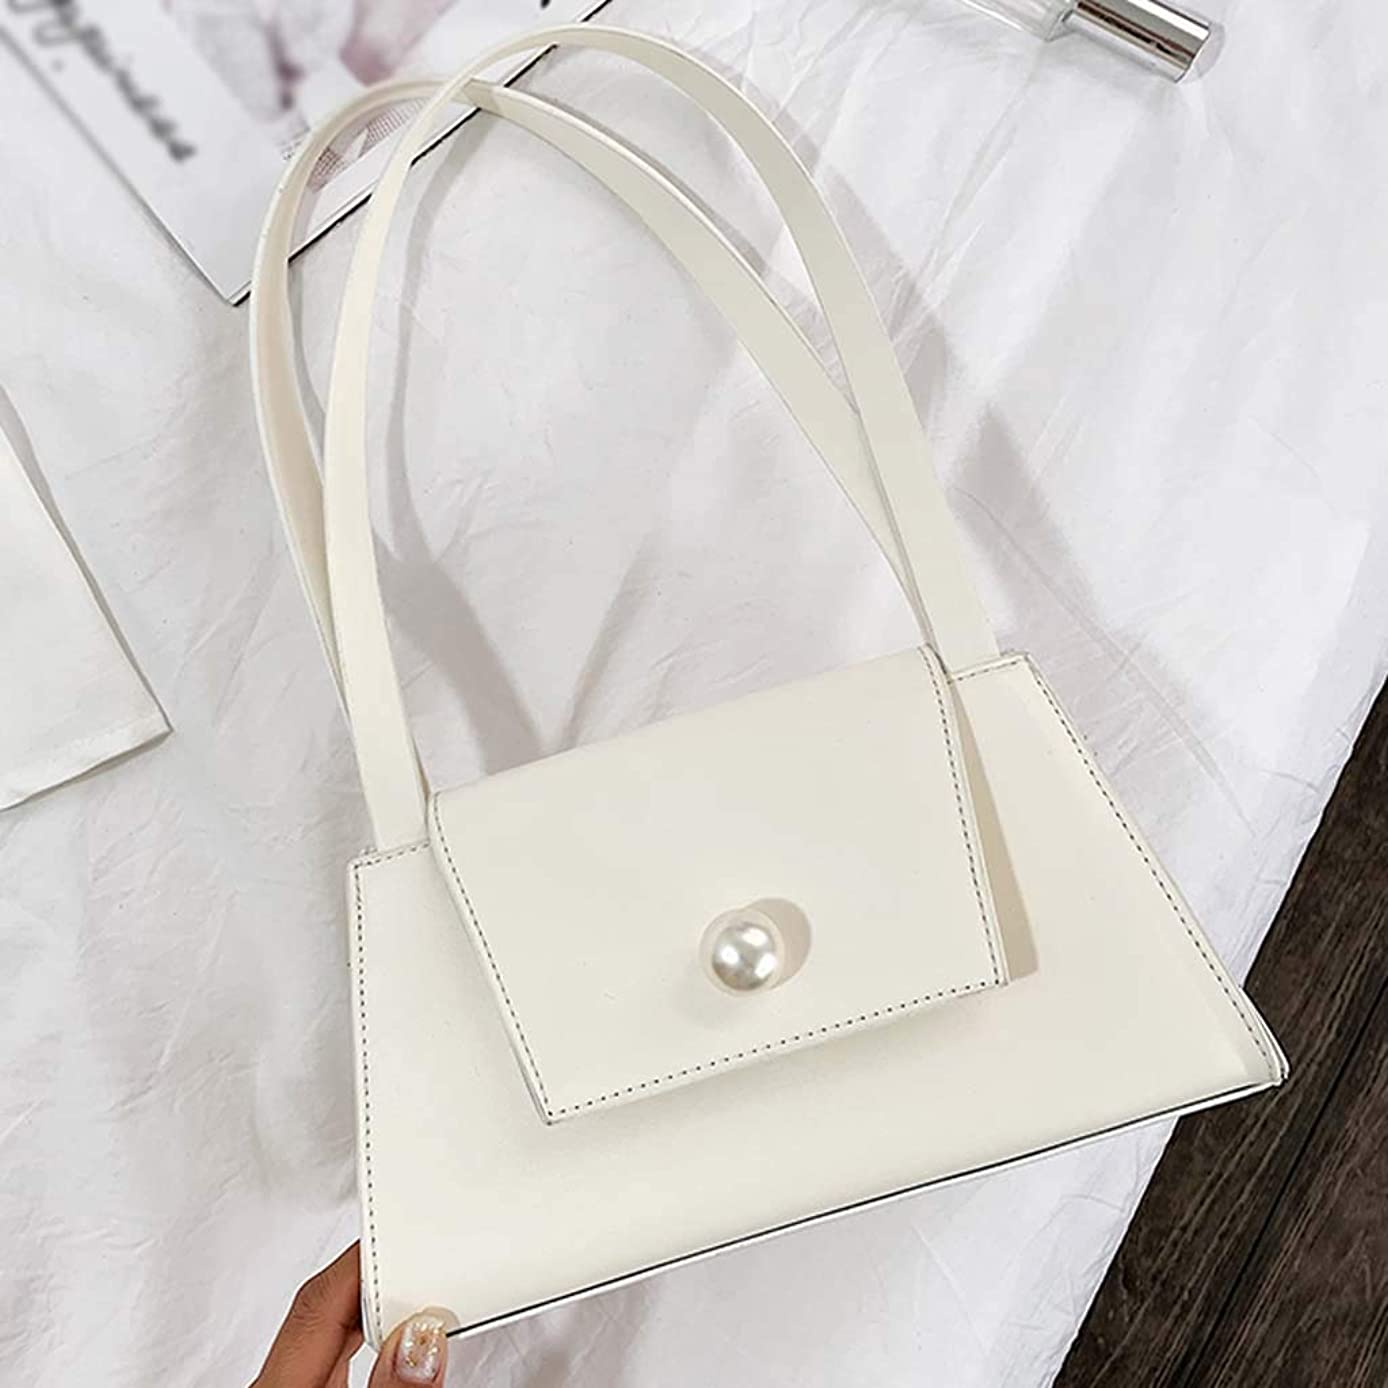 BOLUBILUY Shoulder Bag for Women,Retro Genuine Leather Small Handle Bag Shoulder Bag Diagonal Package Purse Card Phone